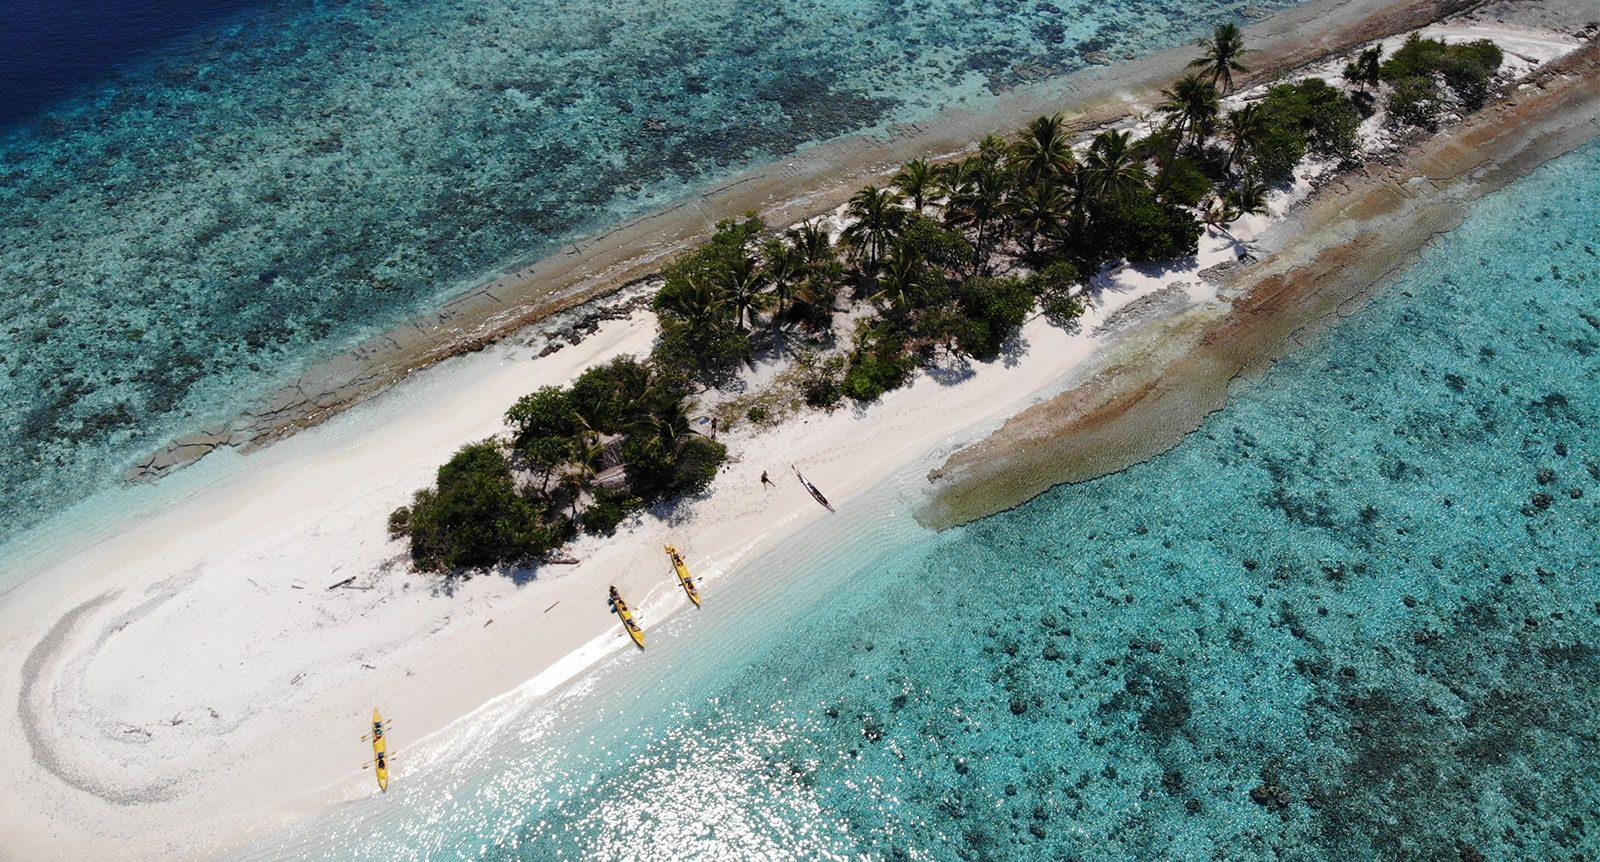 sea-kayaking-papua-new-guinea